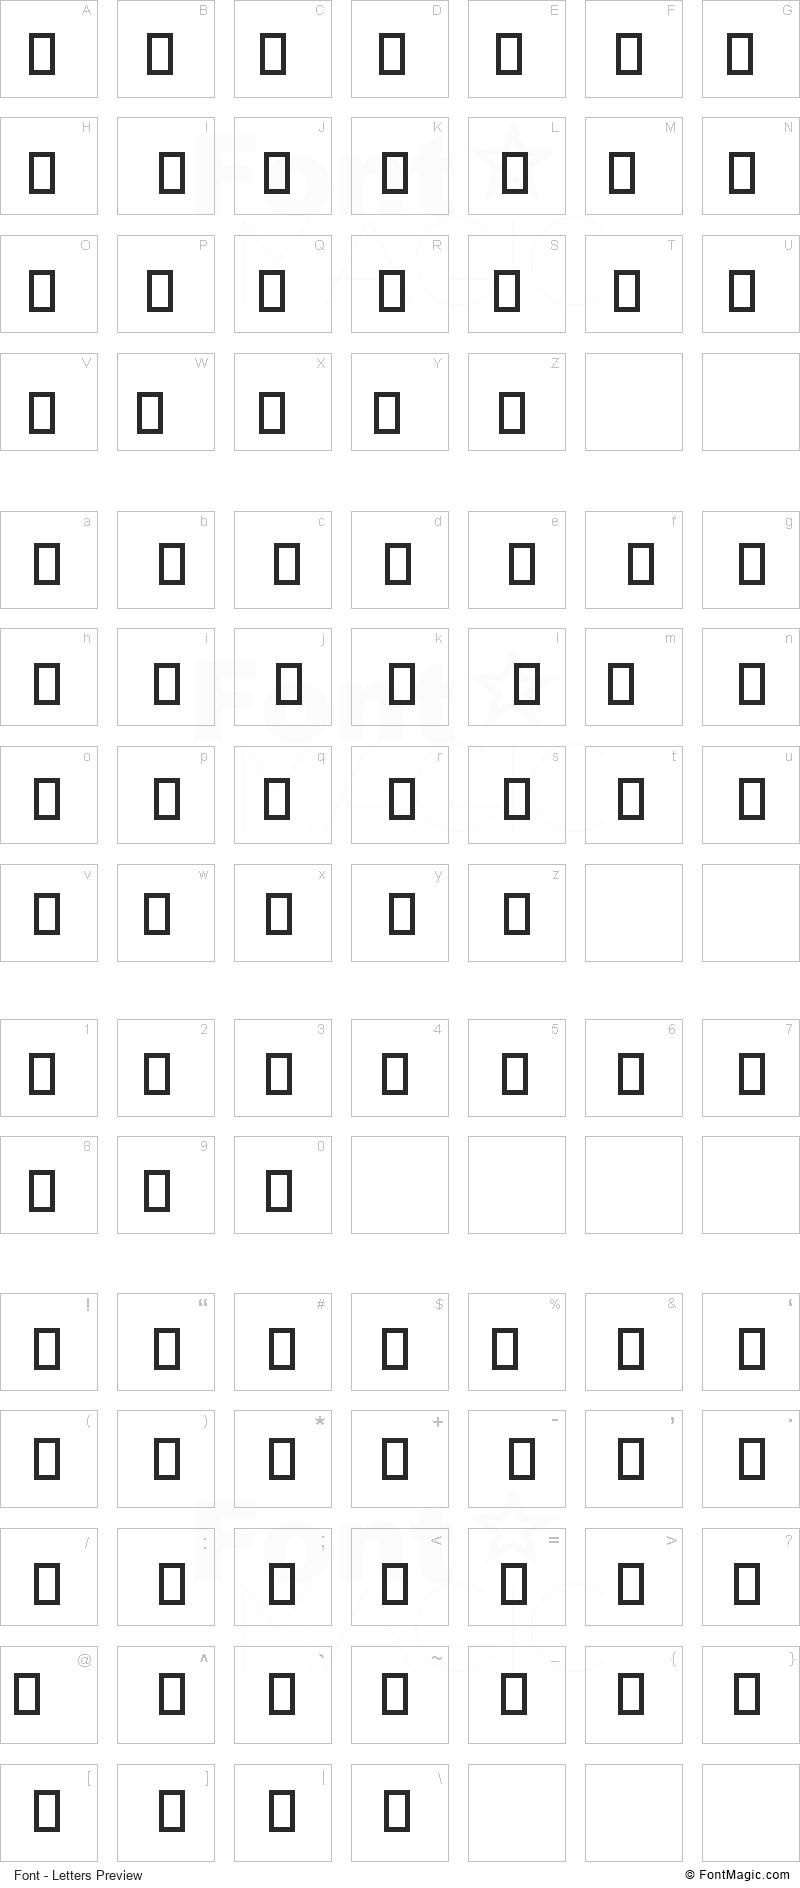 Devoto Font - All Latters Preview Chart